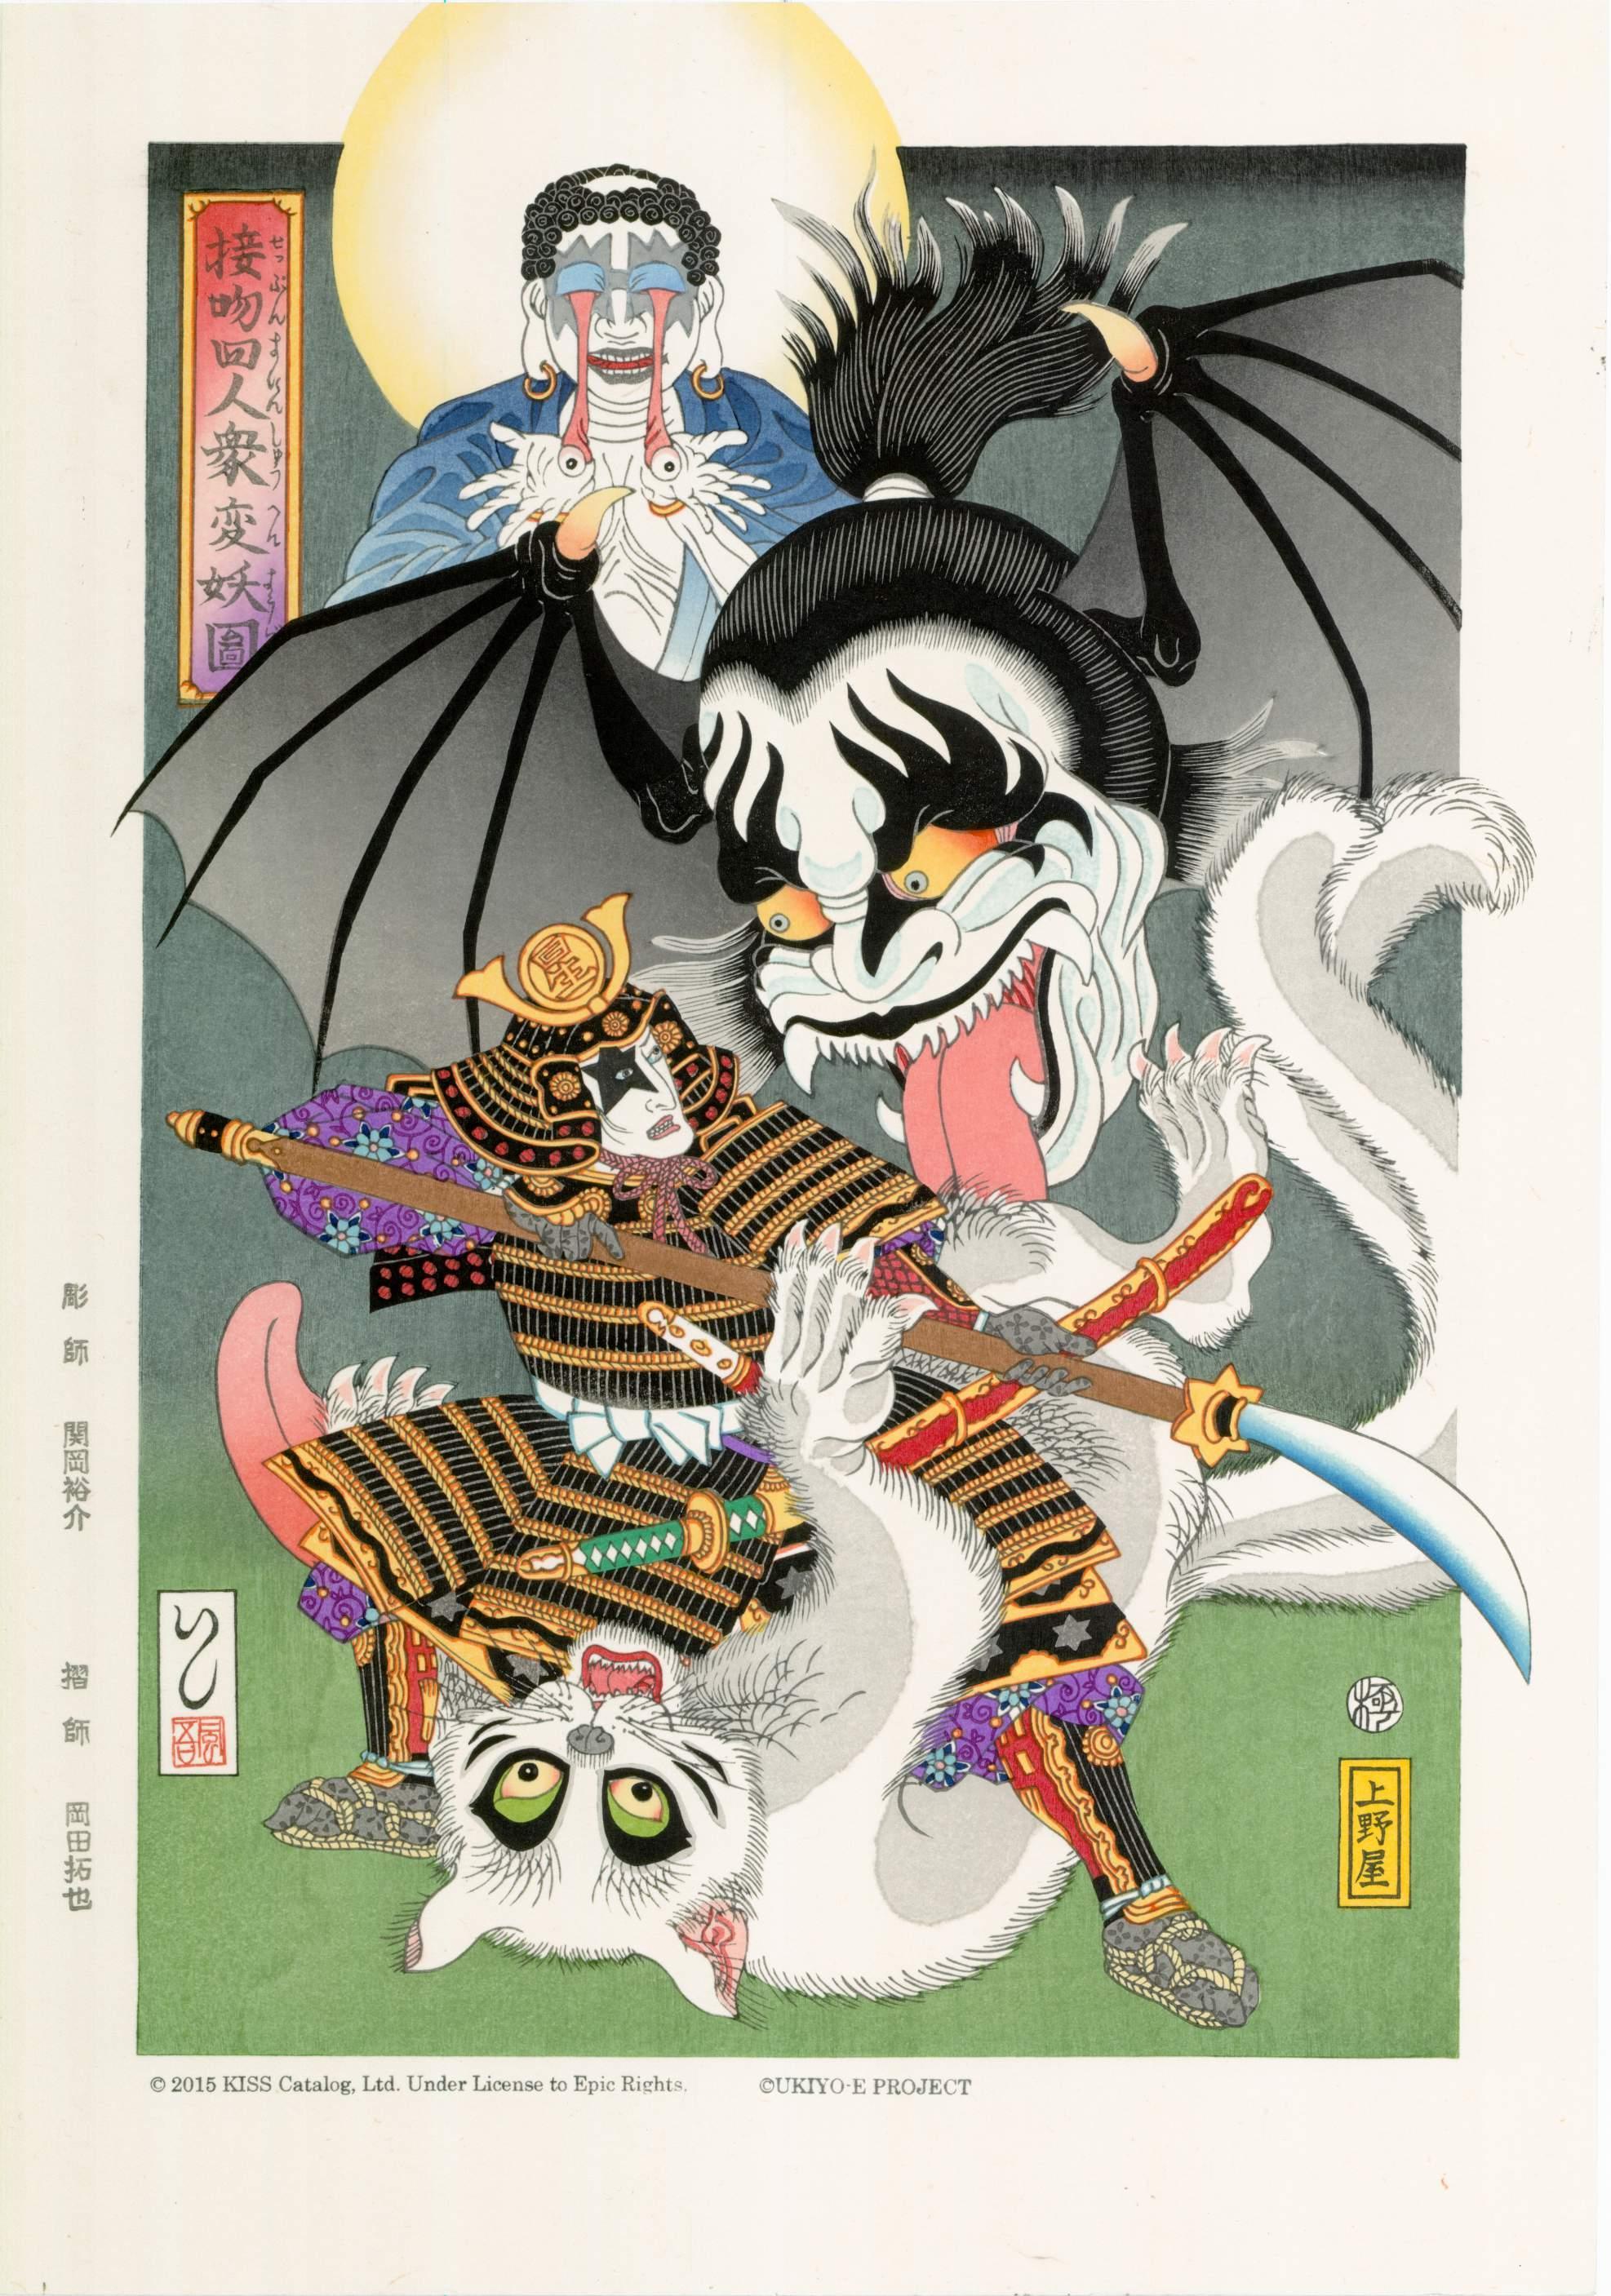 KISS+Monstrous+Ukiyo-e(sm)